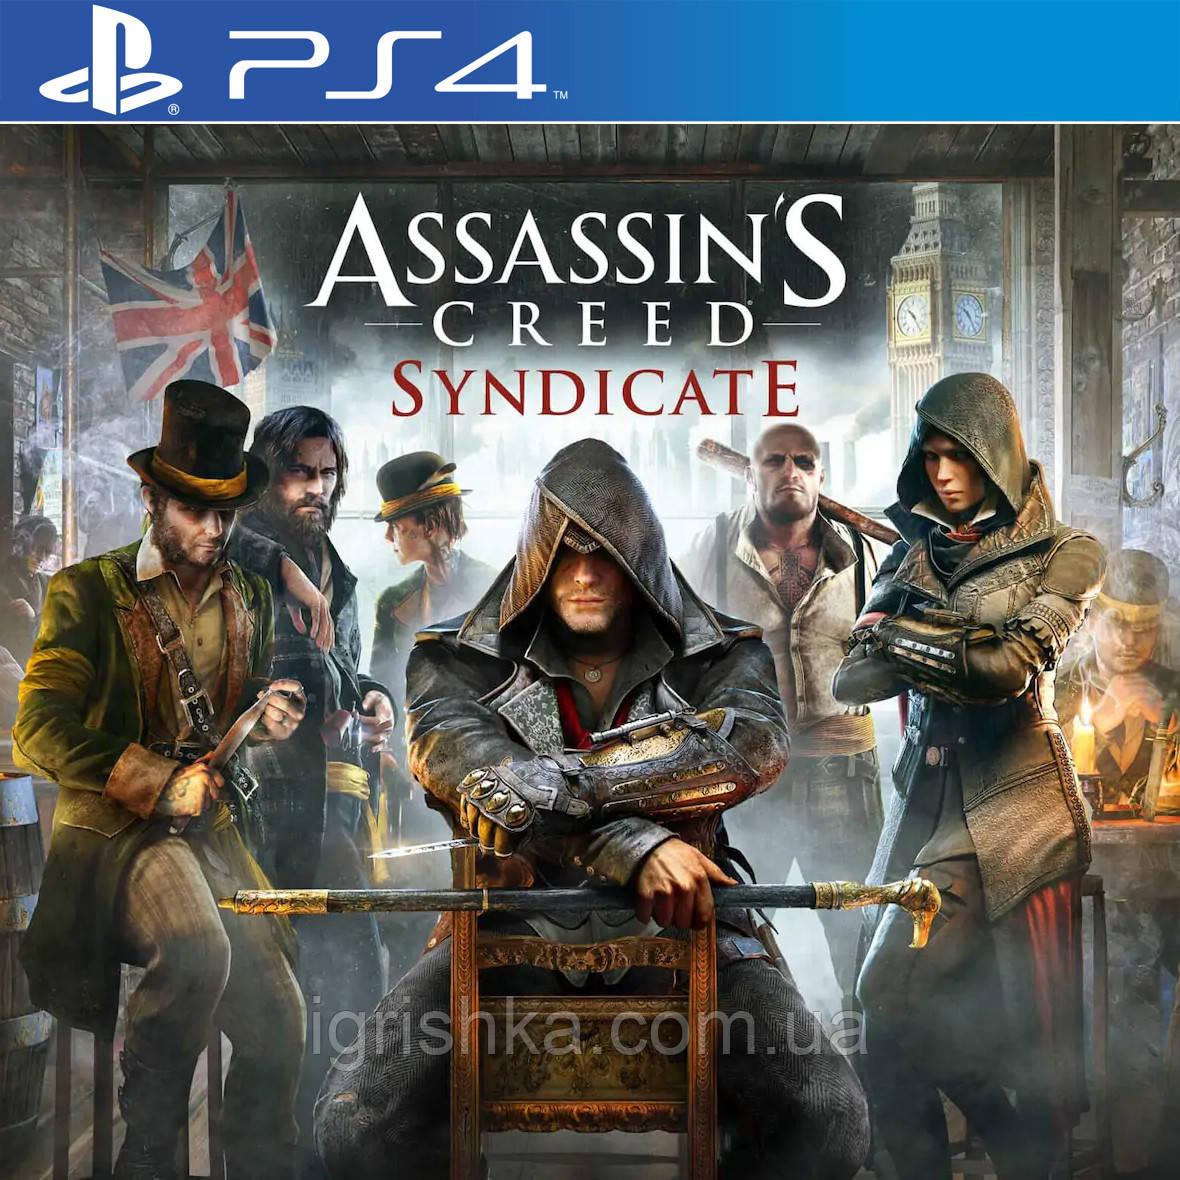 Assassin's Creed Синдикат Ps4 (Цифровий аккаунт для PlayStation 4) П3